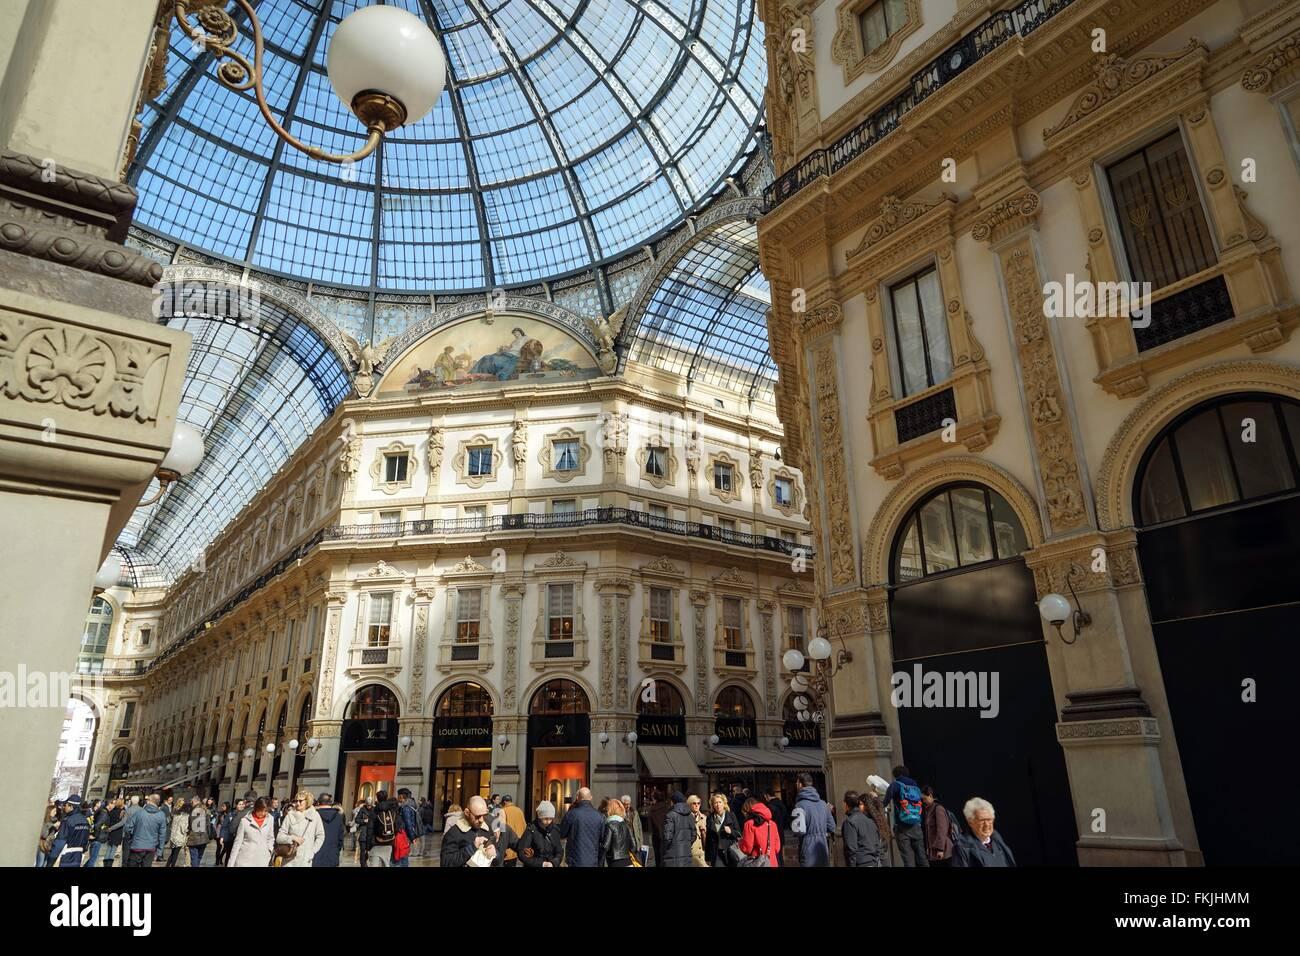 Italy: Louis Vuitton and Savini at Galleria Vittorio Emanuele II, Milan. Photo from 3. March 2016. Stock Photo